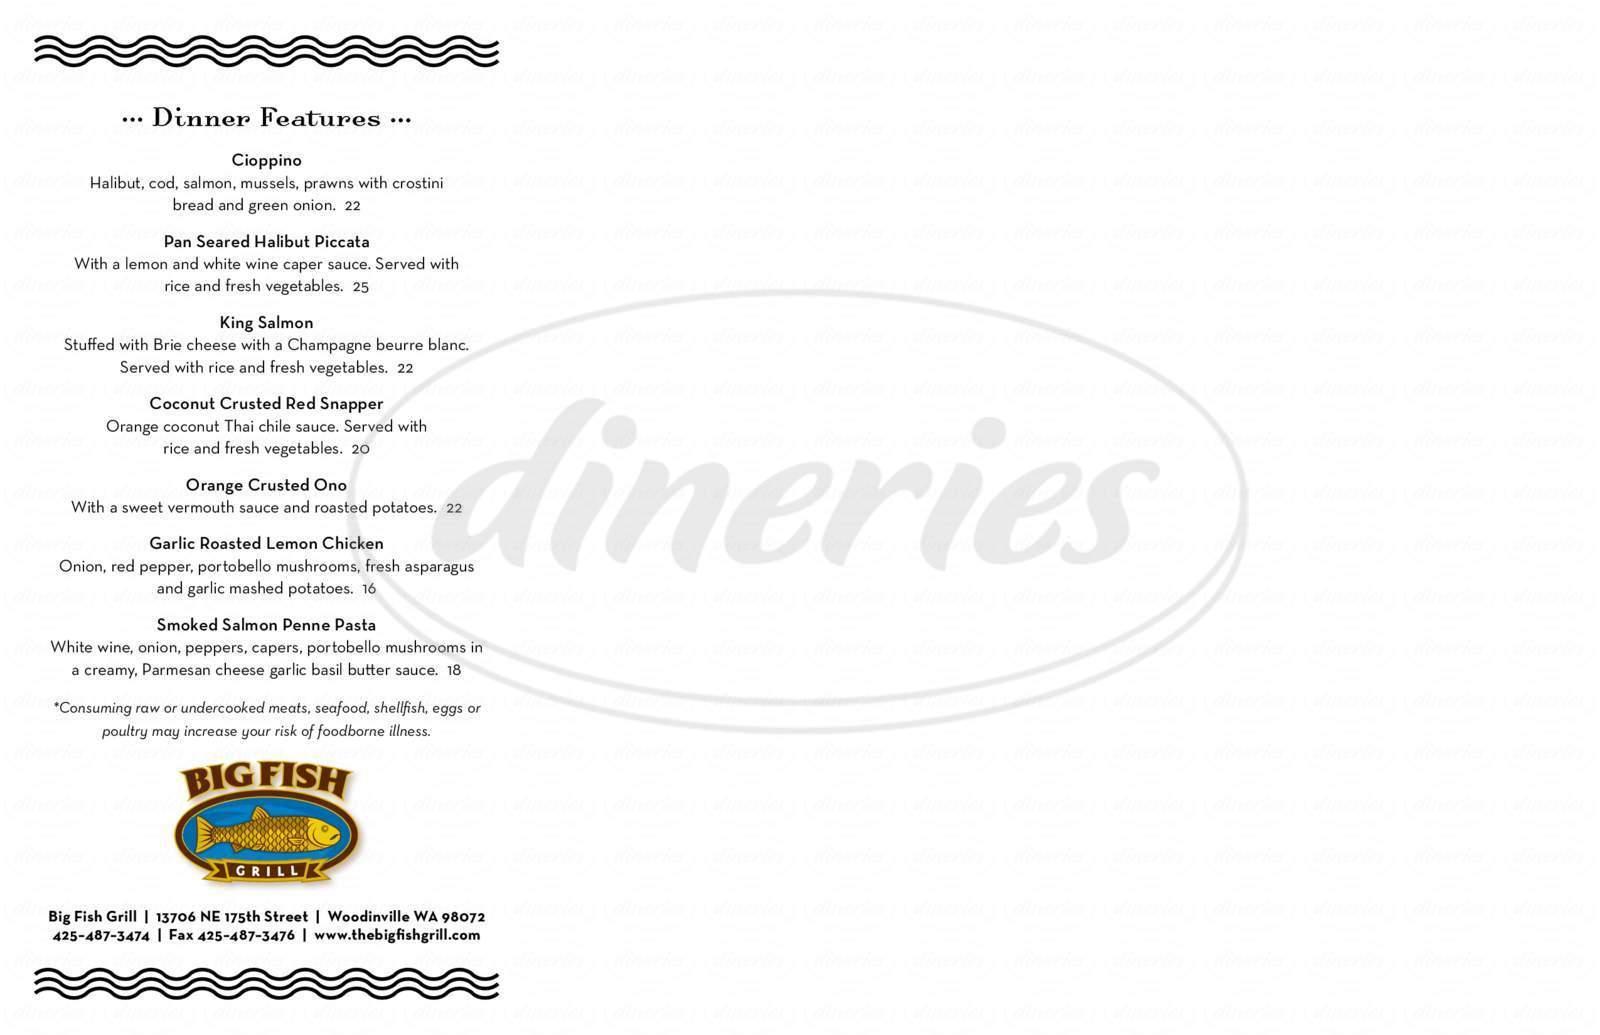 menu for Big Fish Grill